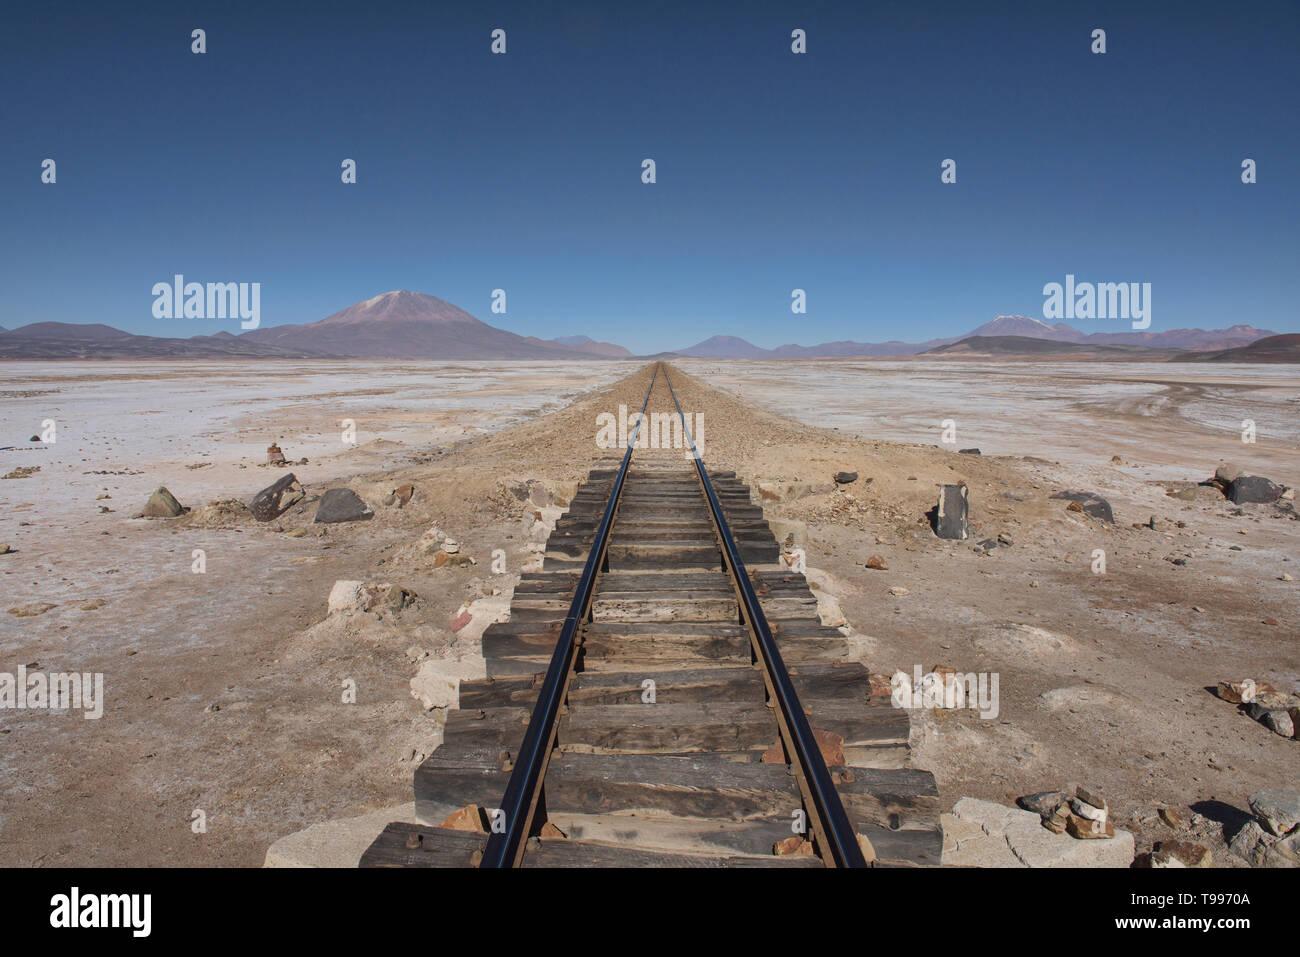 Train tracks stretching to infinity, Salar de Uyuni, Bolivia - Stock Image